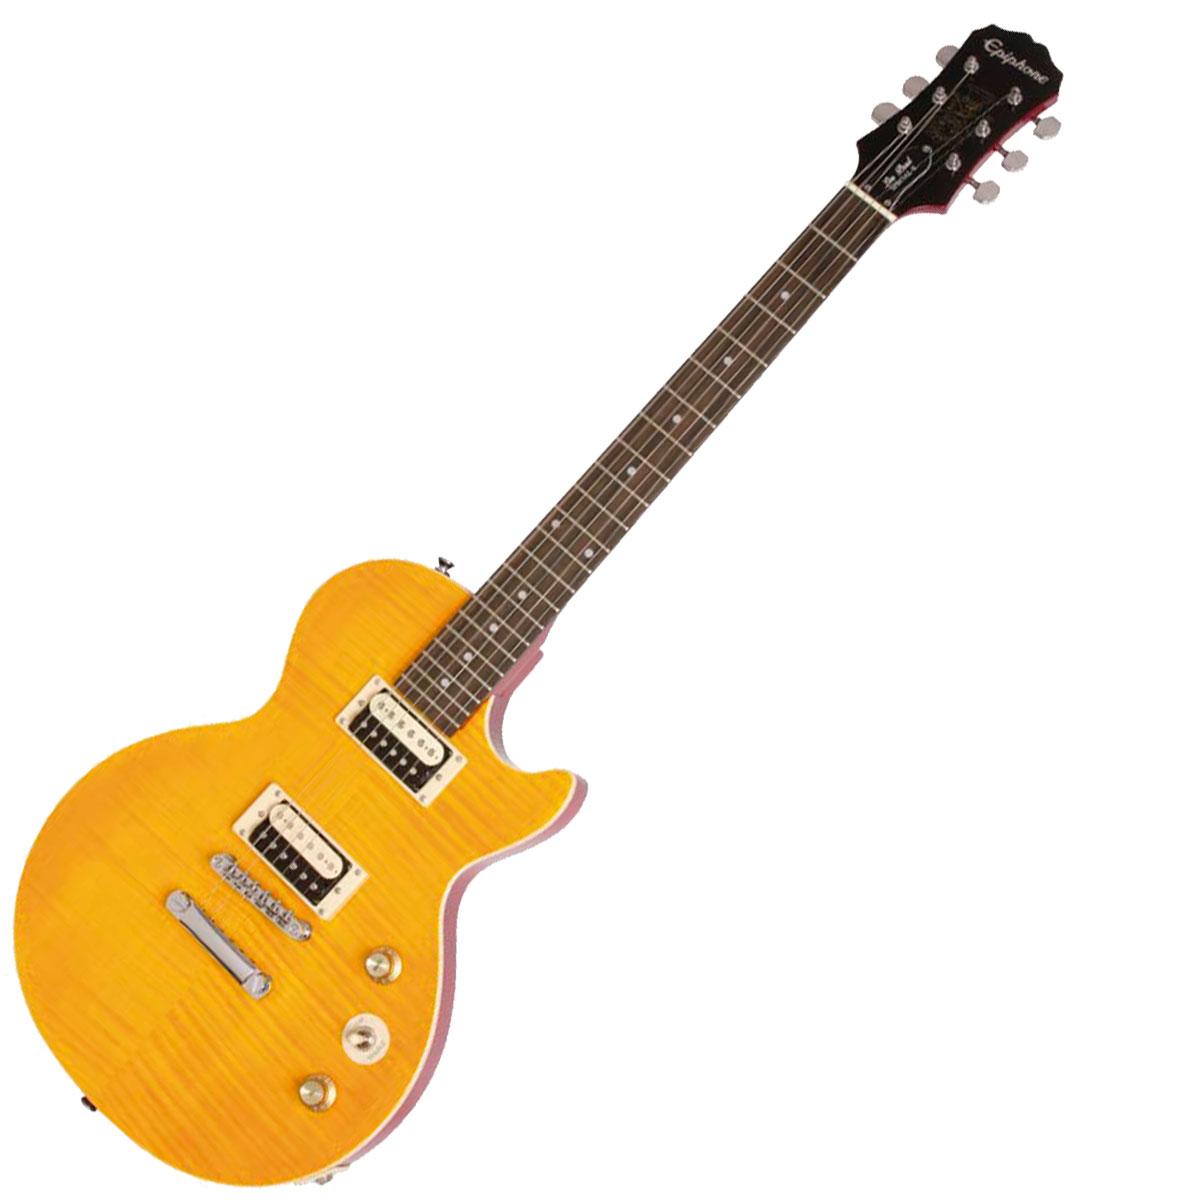 Guitarra Les Paul Special Slash AFD Signature - Epiphone